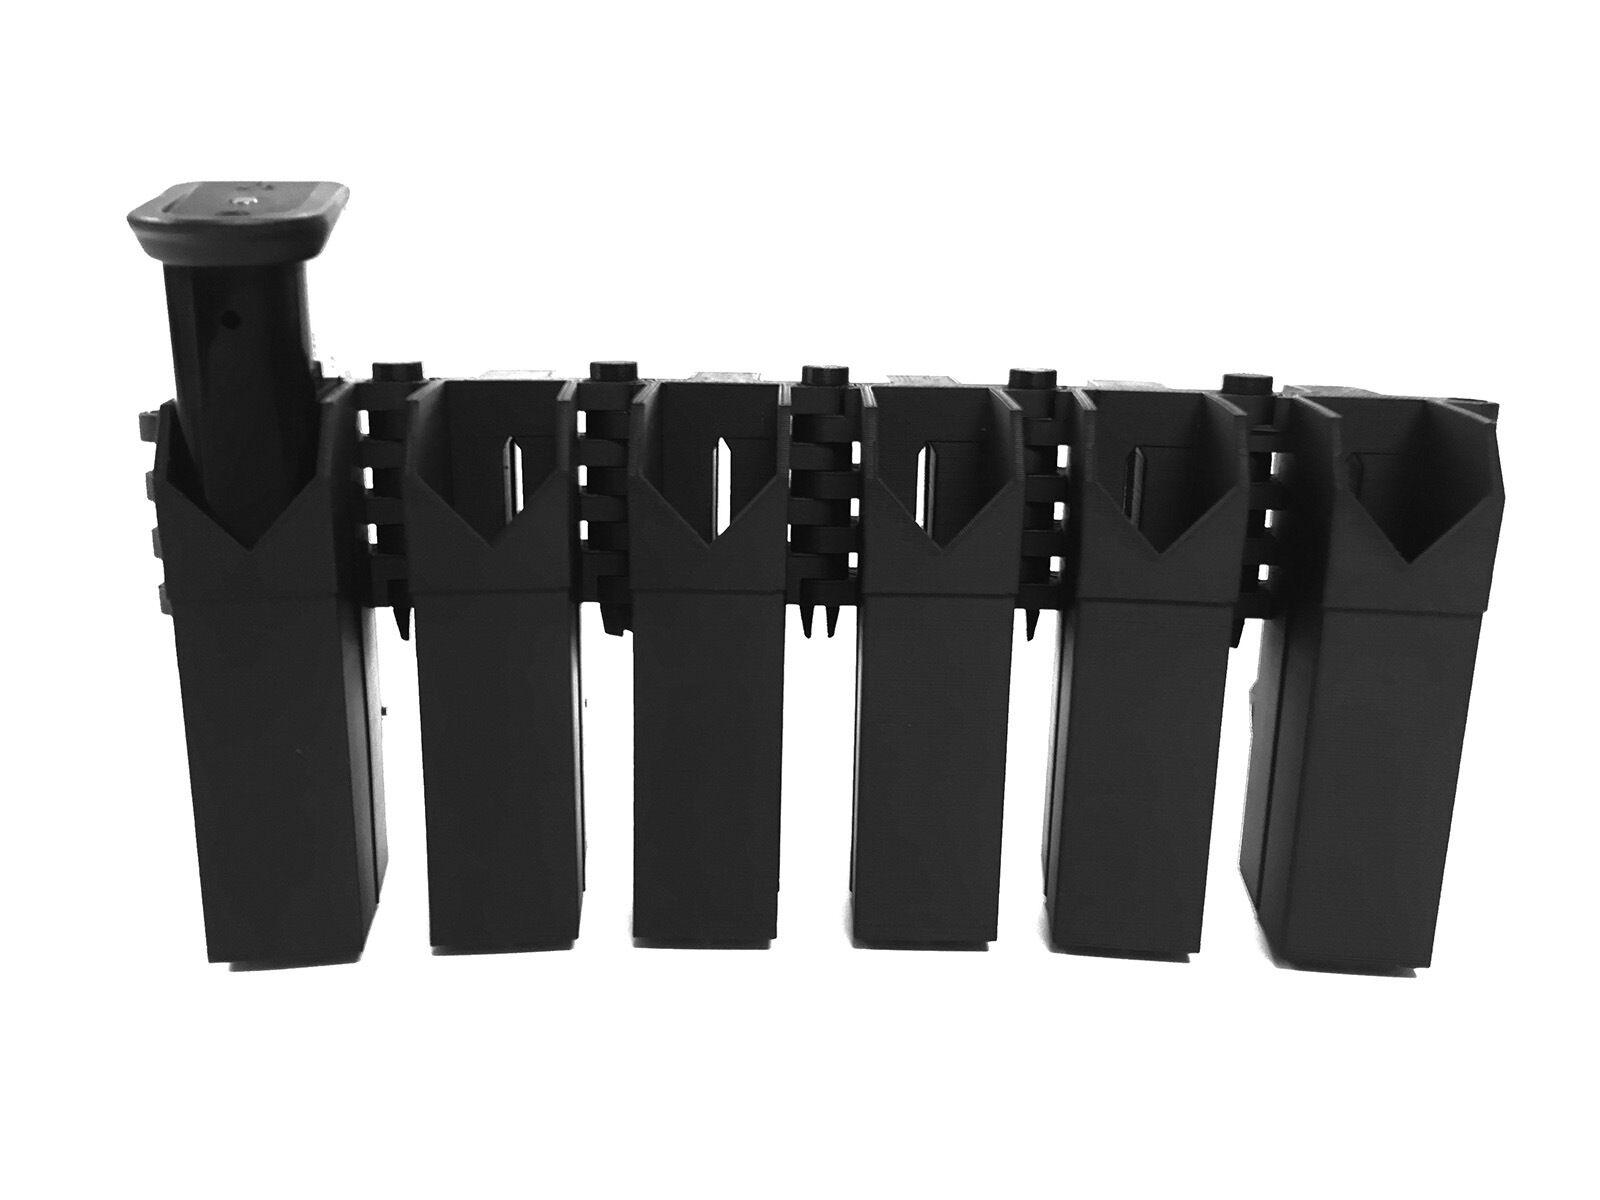 Eamp Patriot-Sig Sauer P226 P228, Canik TP9, Beretta para 9mm 54-F bolsa de seis